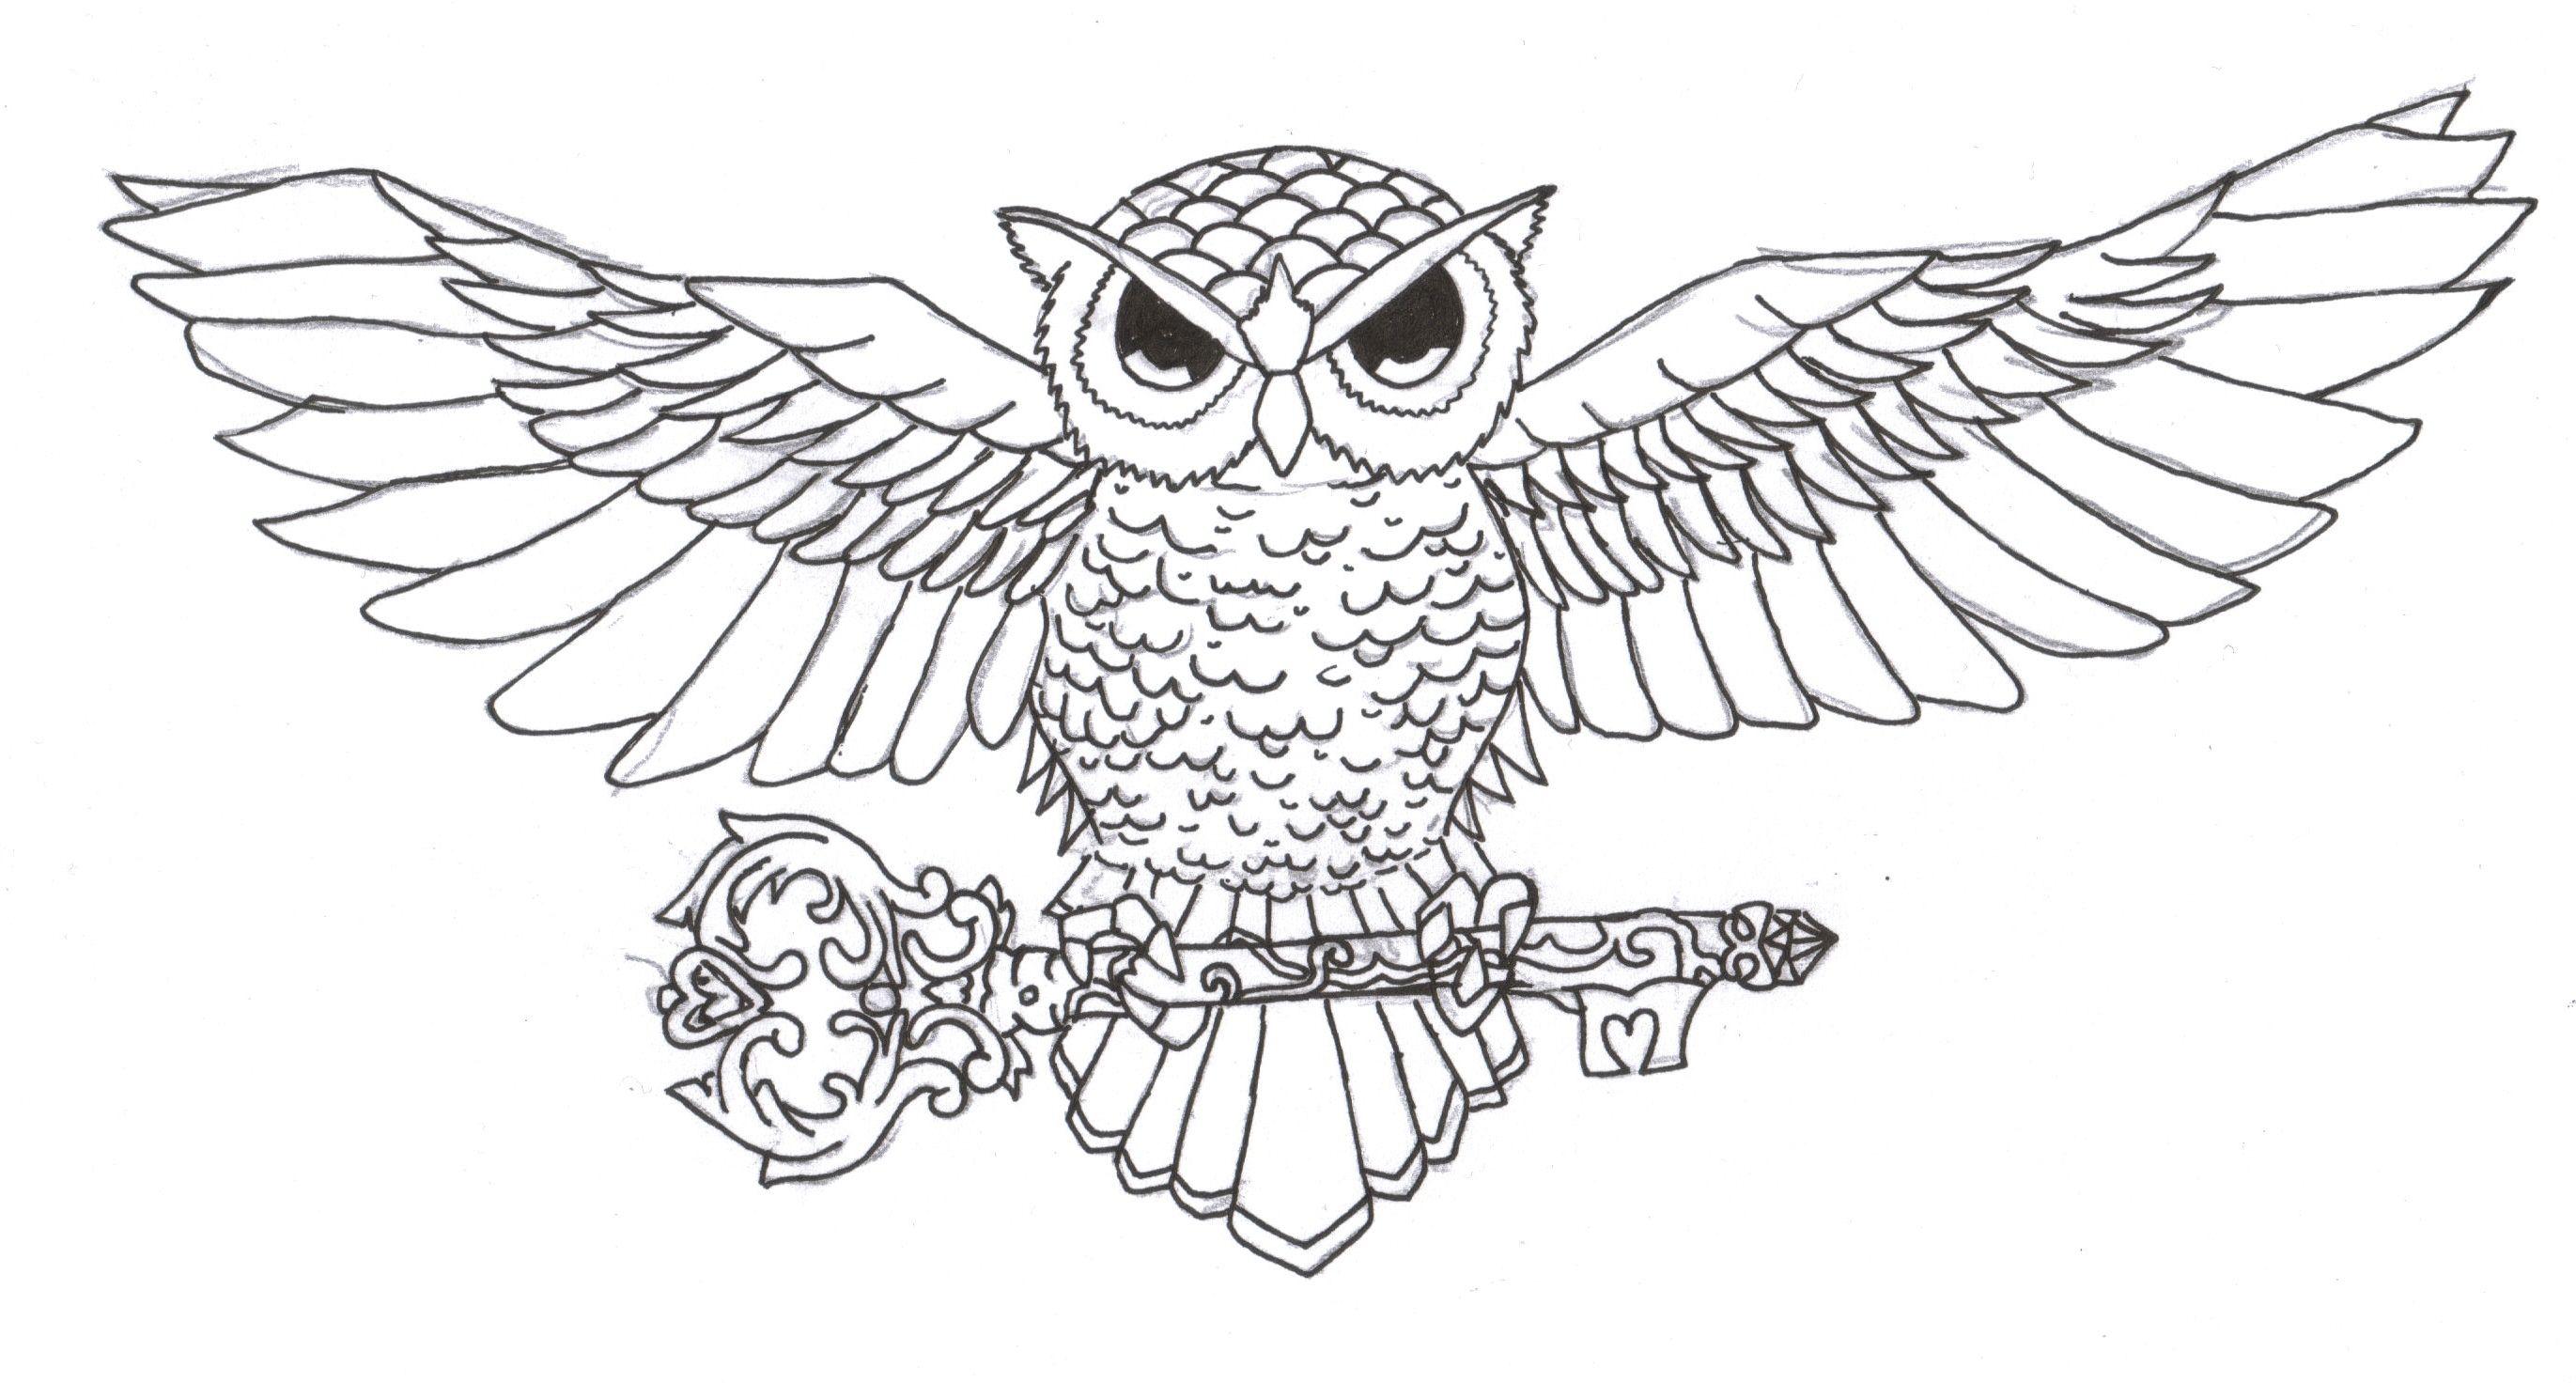 Owl Tattoo Design By Owl Chest Tattoo Designs Drawings Owl Tattoo Chest Owl Tattoo Design Celtic Owl Tattoo Design